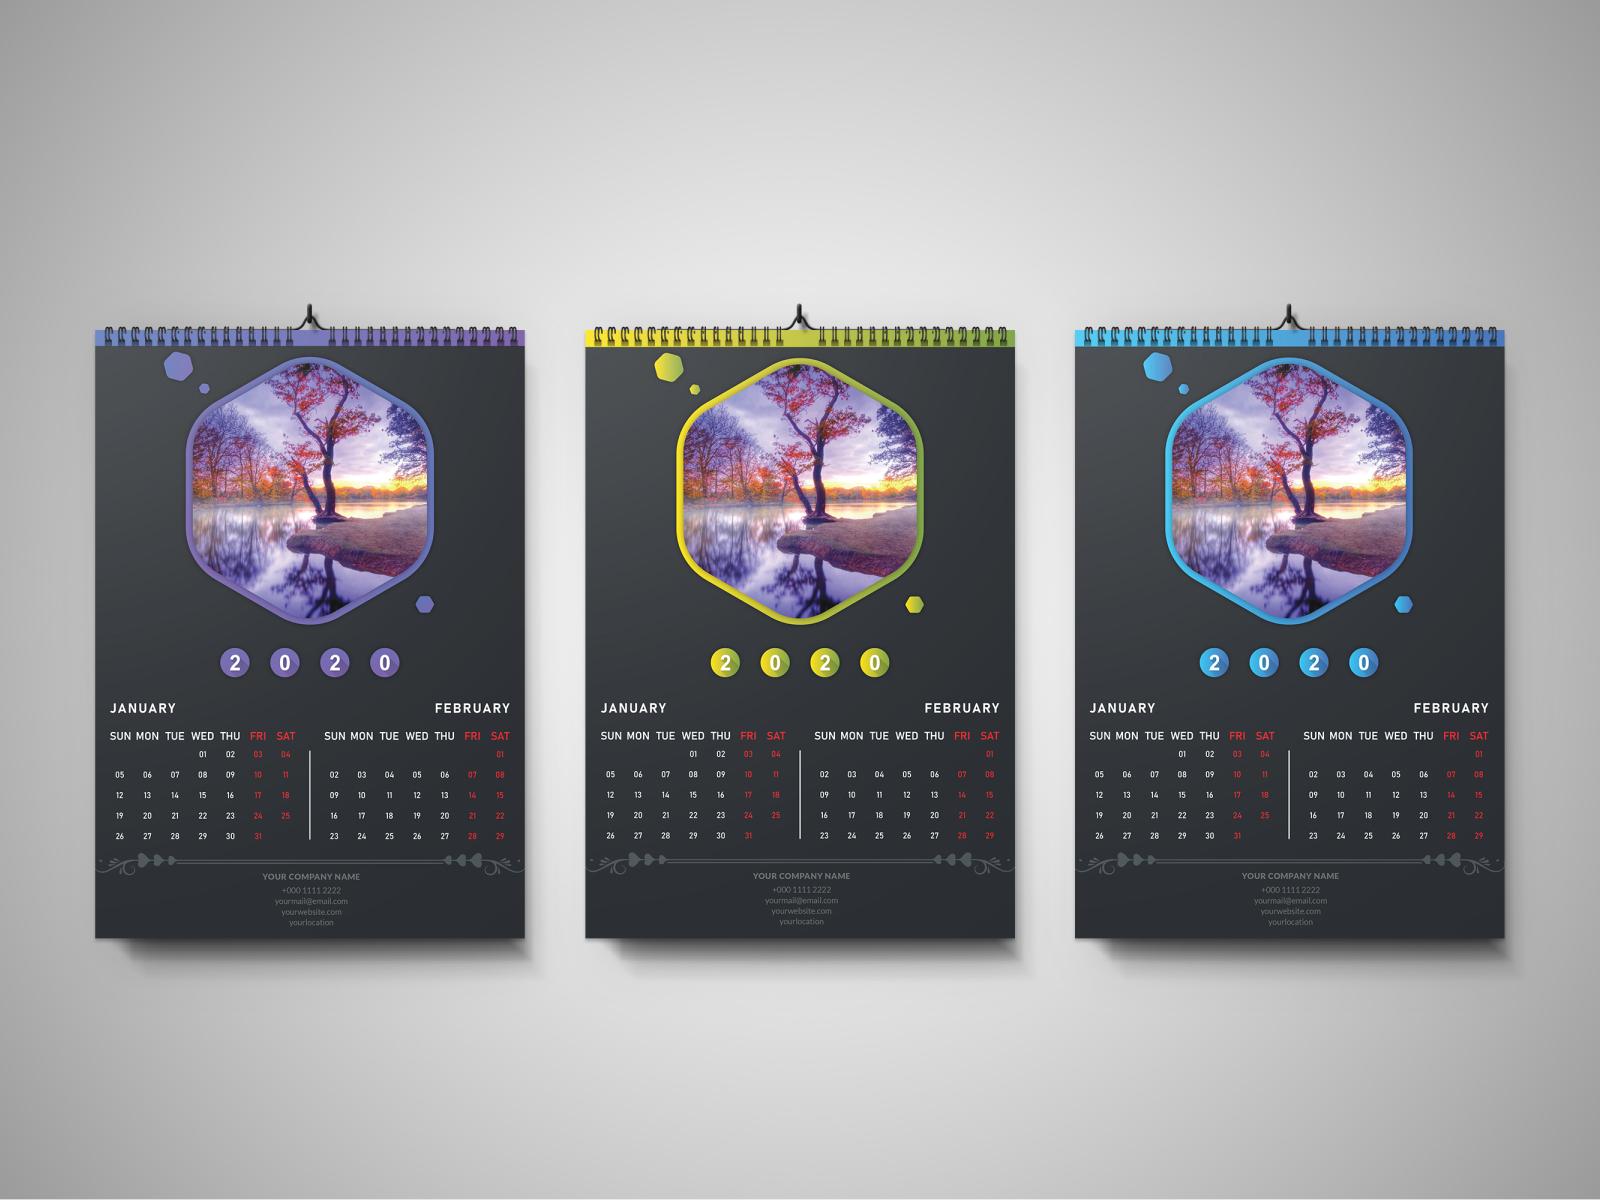 Ut Austin Calendar Spring 2020.Wall Calendar 2020 By Fazle Rabbi On Dribbble